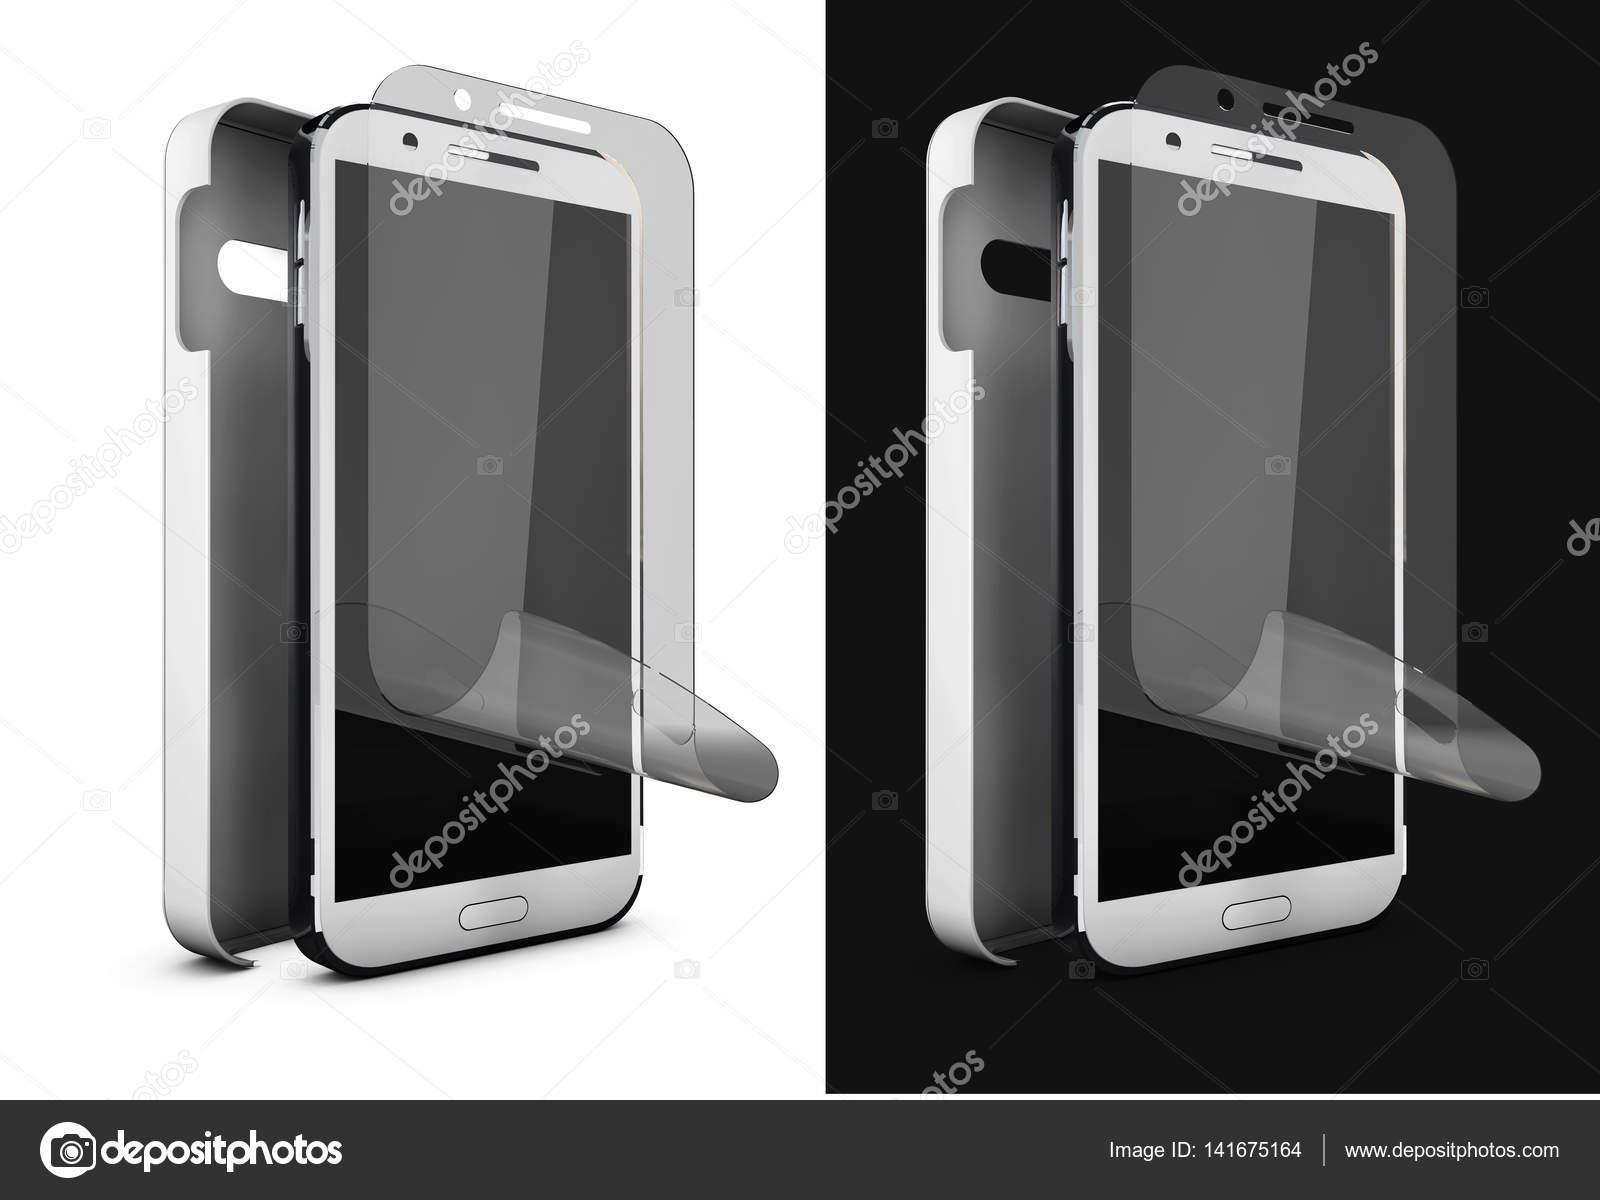 7c76e4de284c 3D απεικόνιση του τηλεφώνου φιλμ προστασίας στην οθόνη και κάλυμμα.  Smartphone οθόνη με προστατευτικό γυαλί. Απομονωμένα σε μαύρο και wite–  εικόνα αρχείου